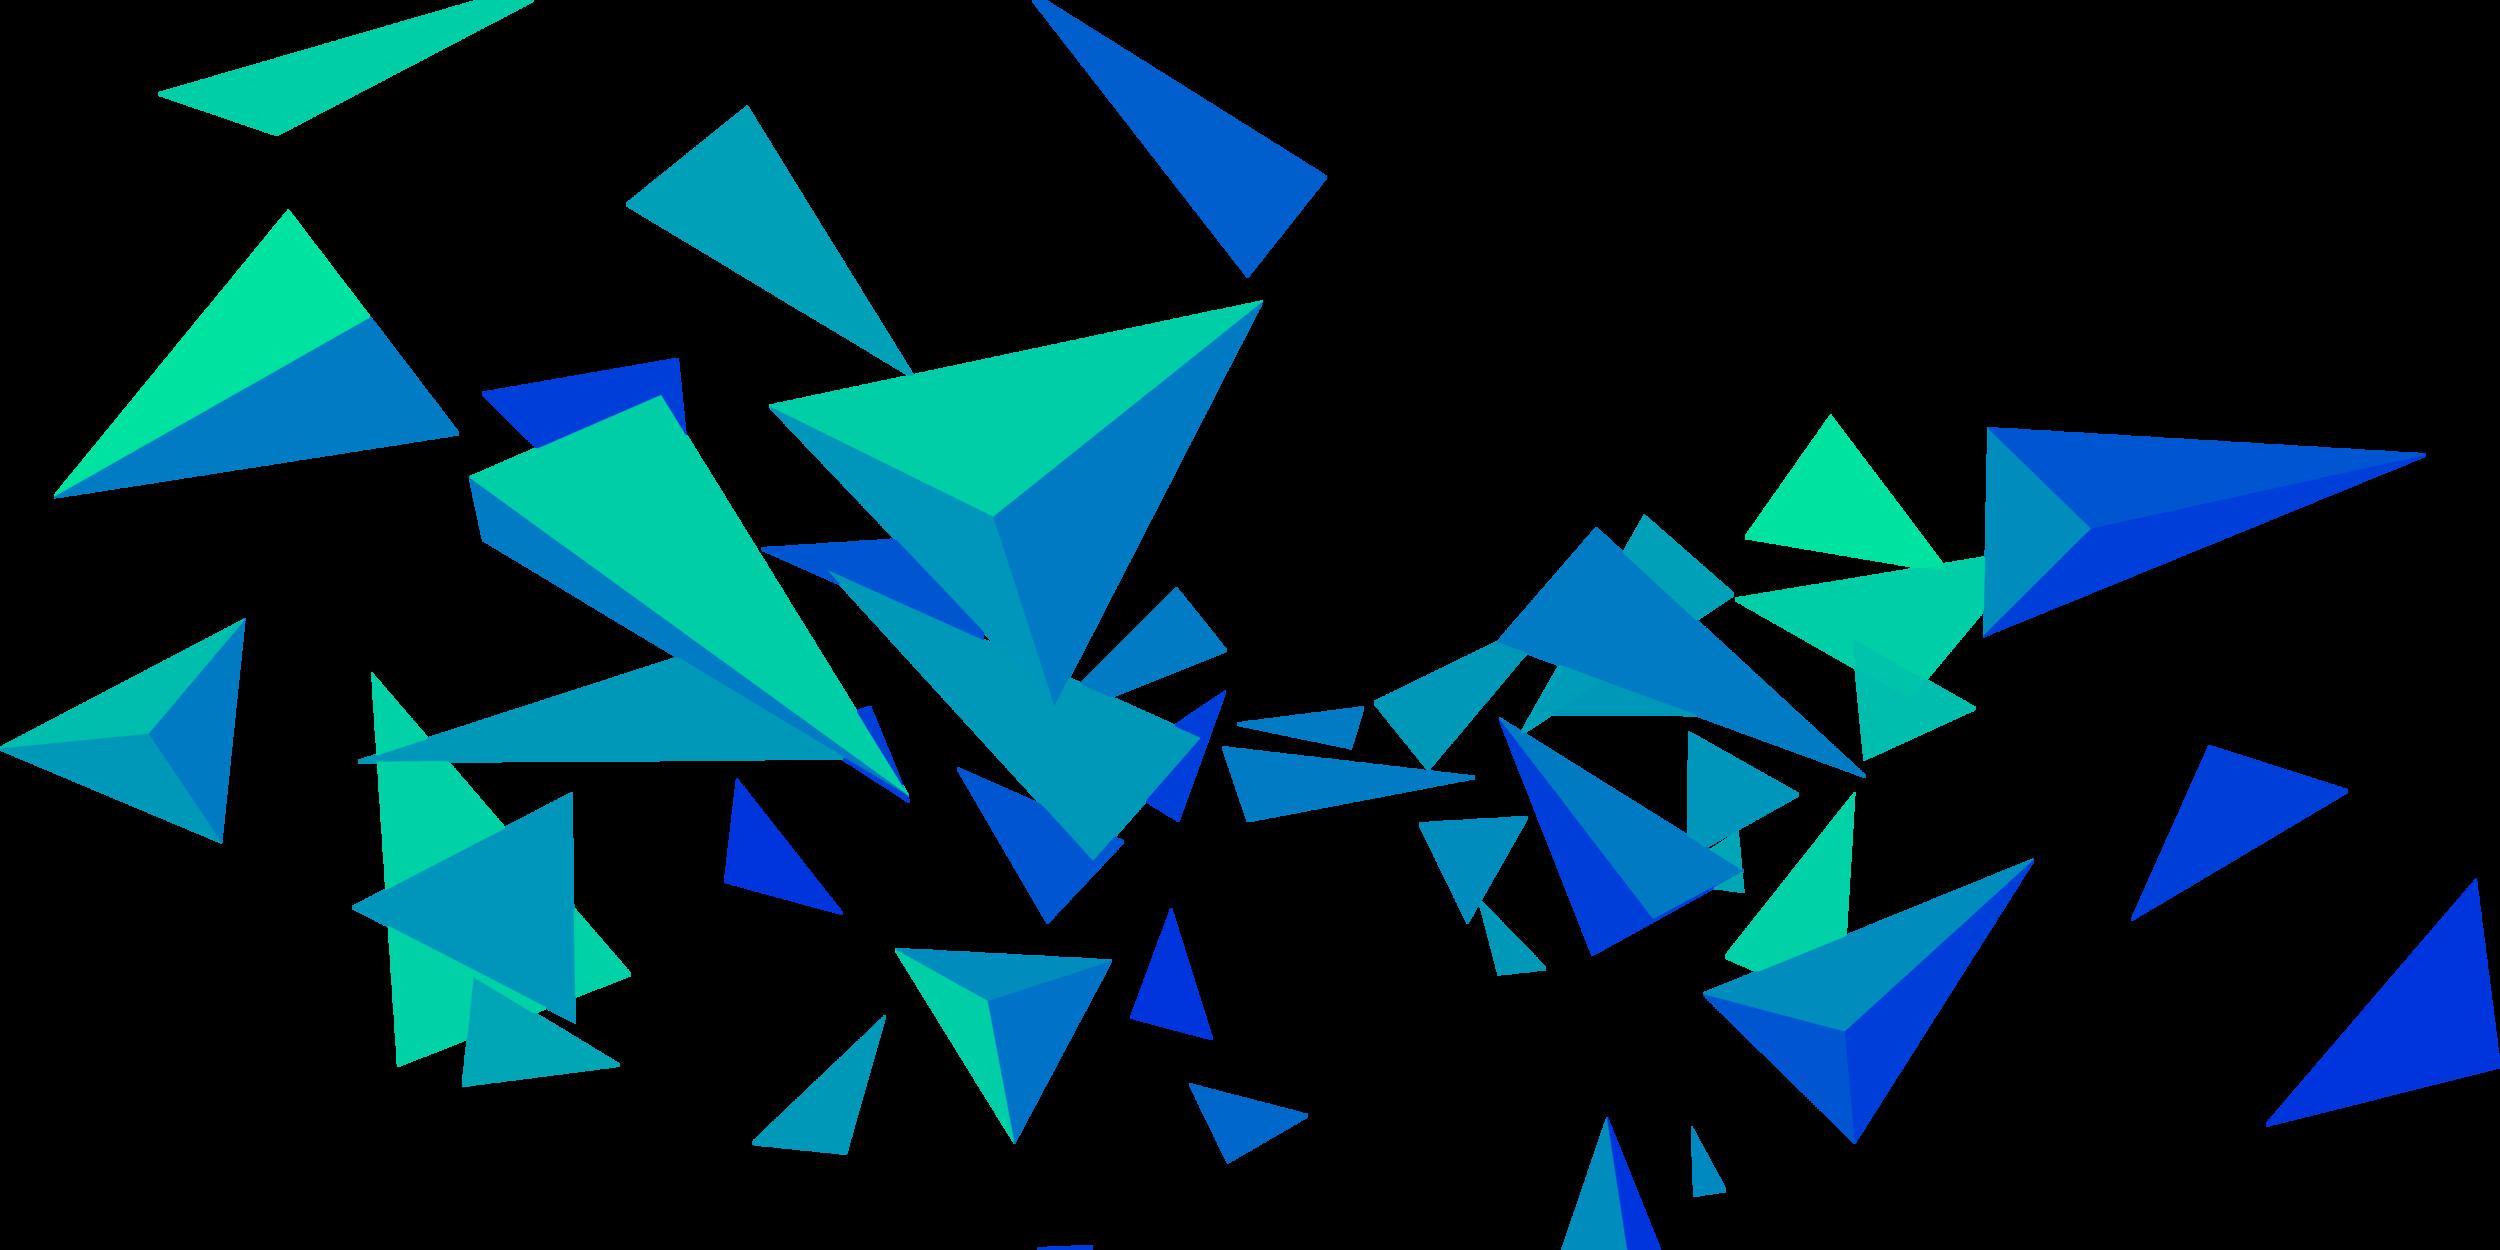 Medium_Header_abstractMesh-01.png